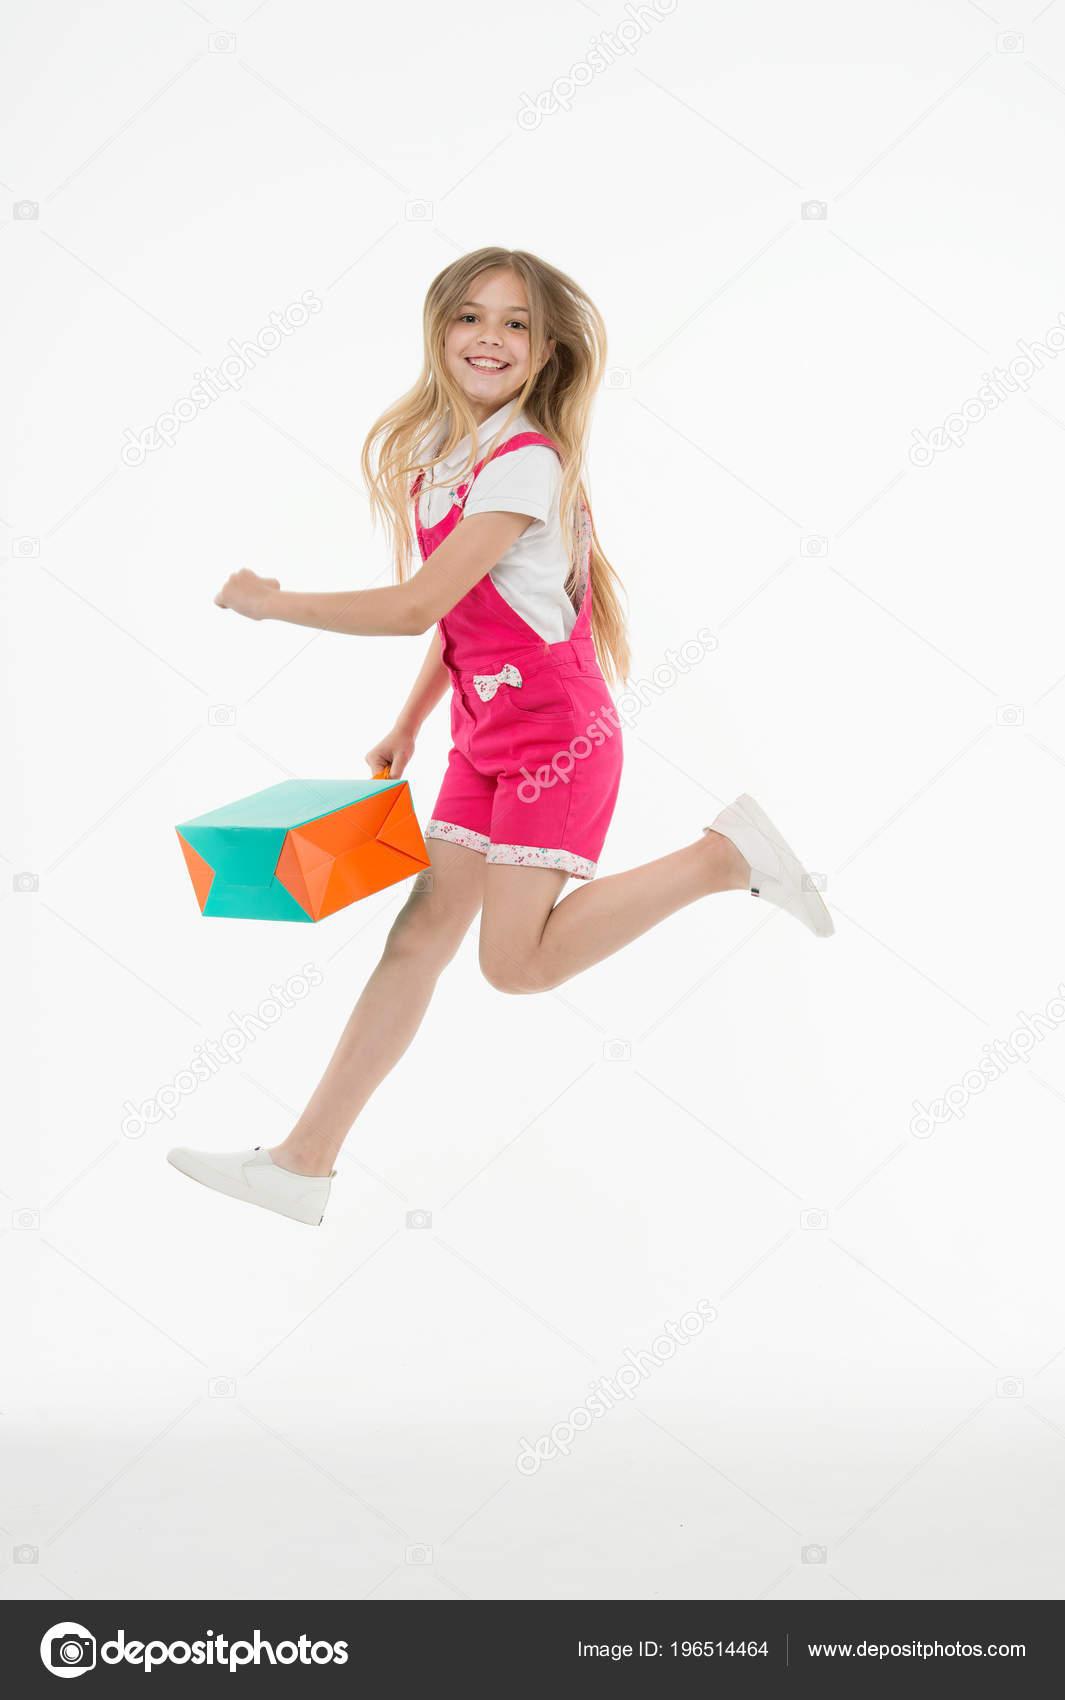 809970c5 Happy Girl Jump Shopping Bag Isolated White Little Child Smile — Stock Photo